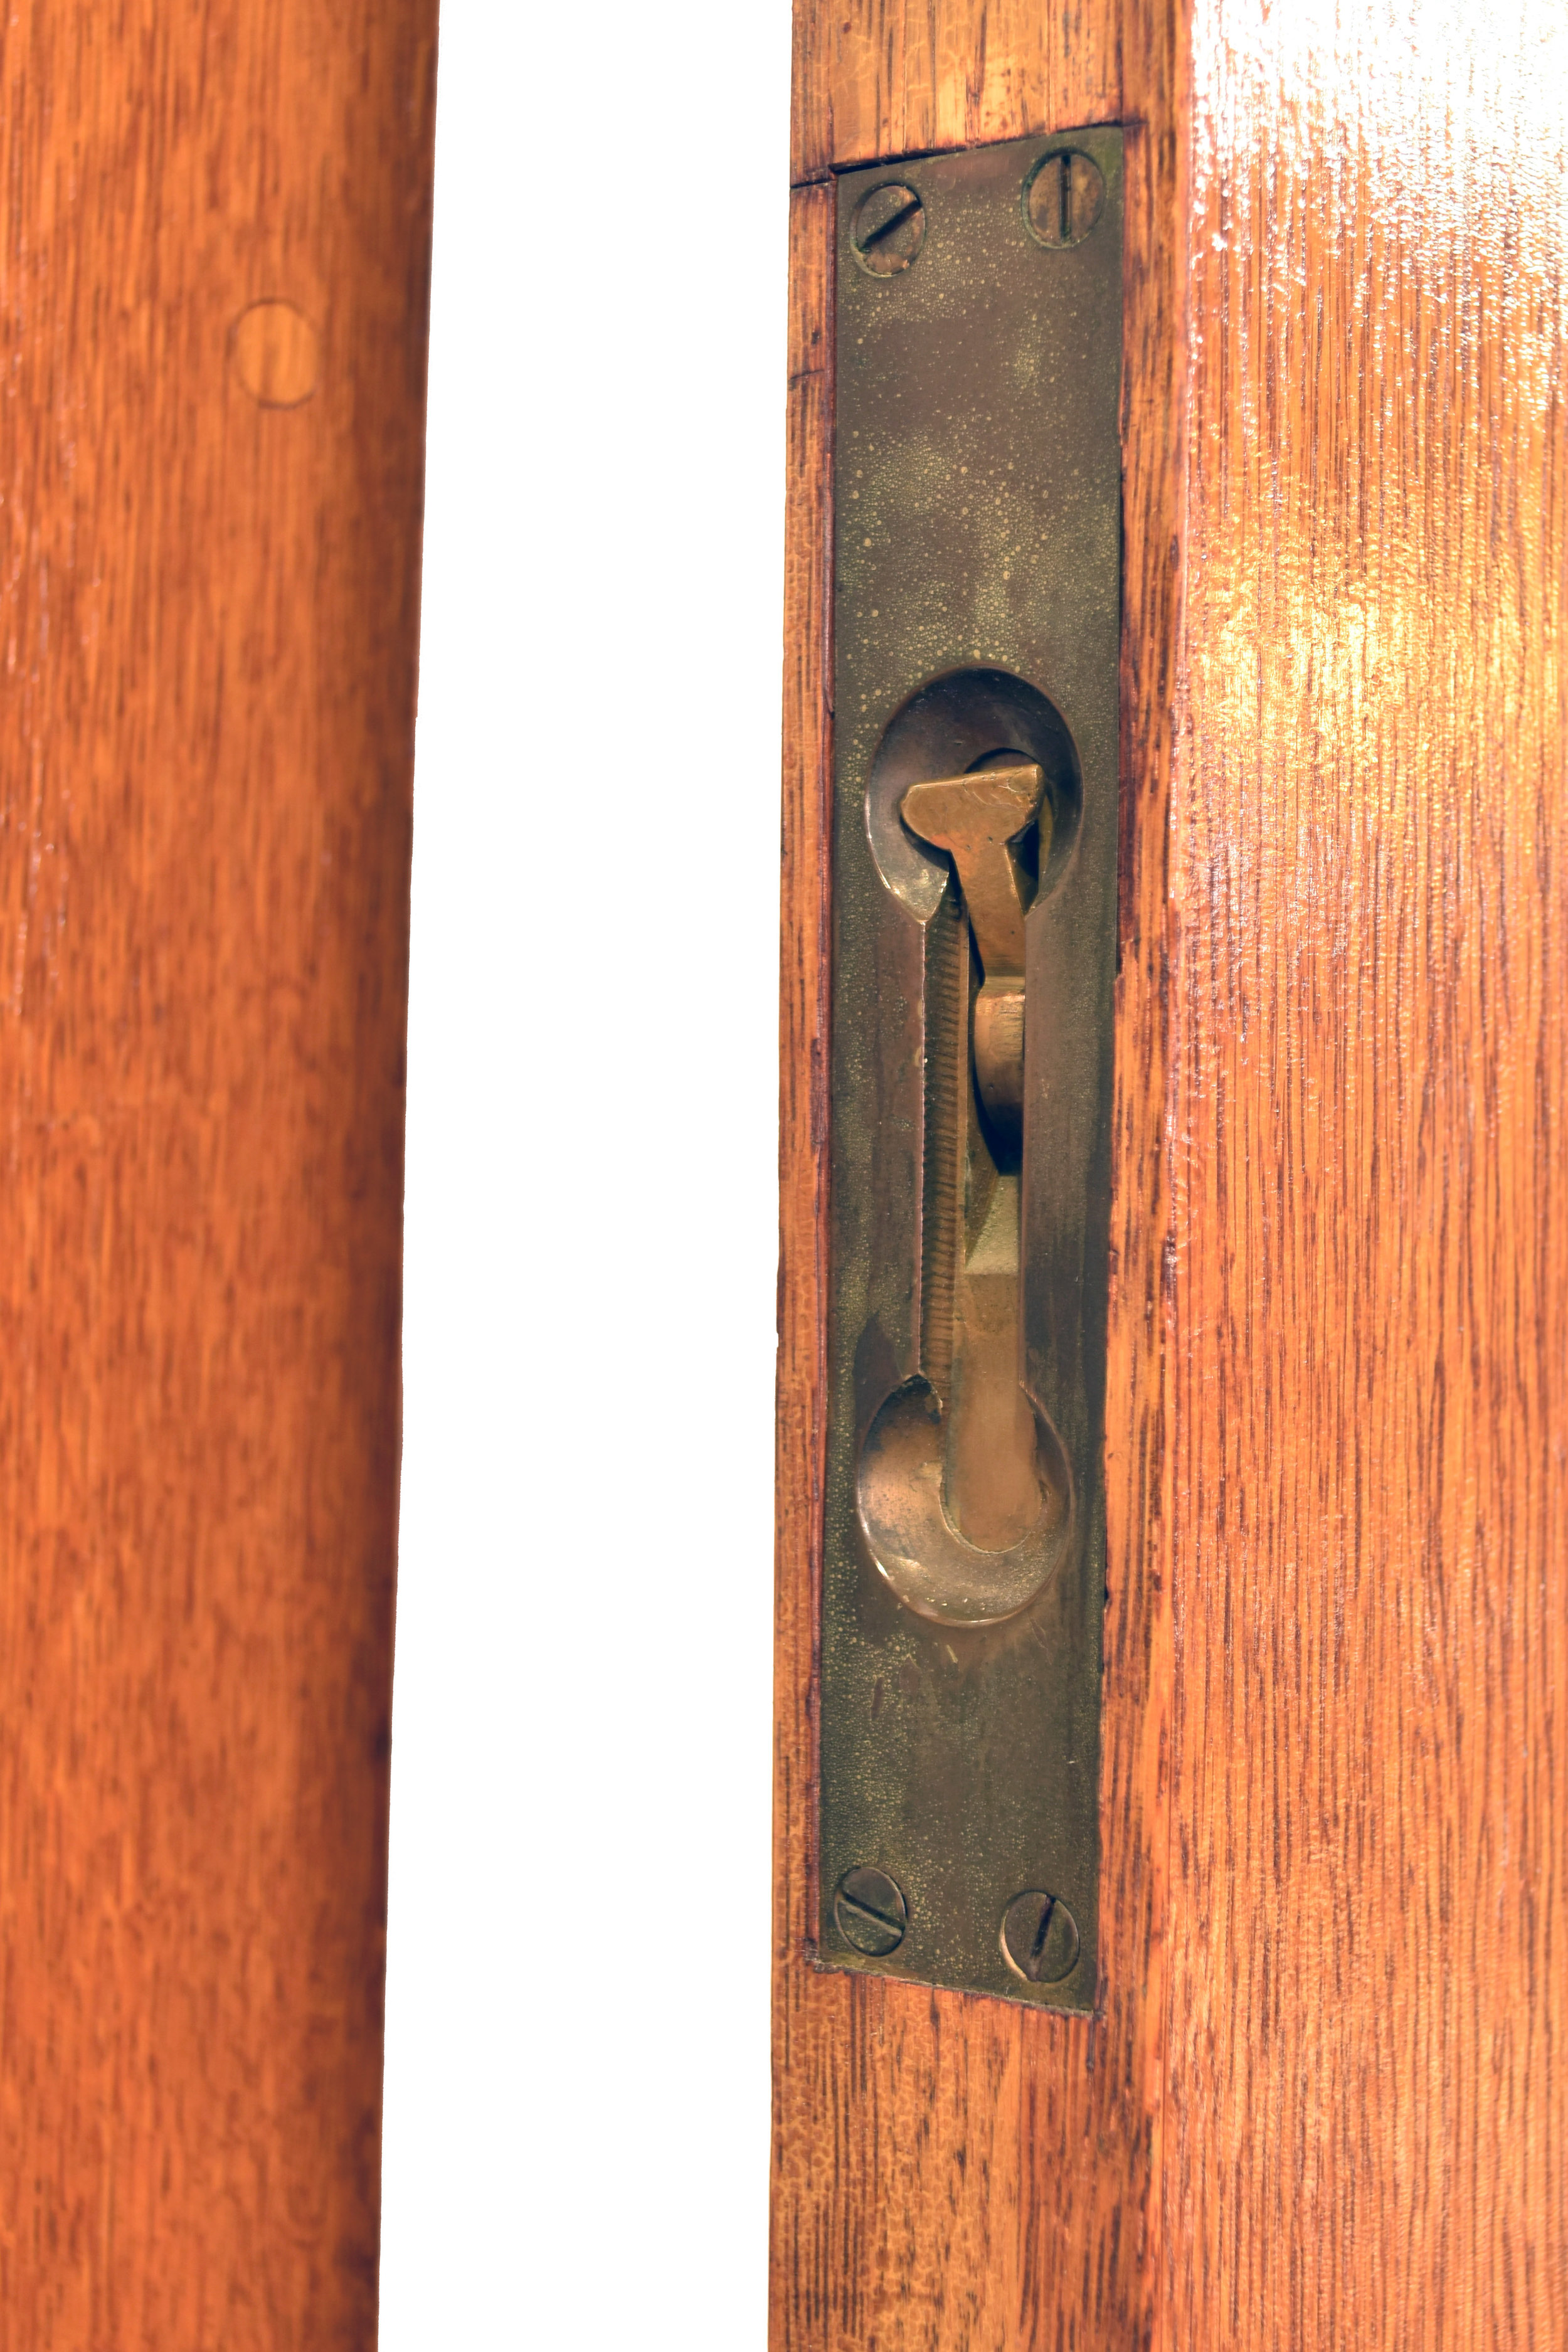 48407 oak double door 8 lite clear glass cremone latch.jpg